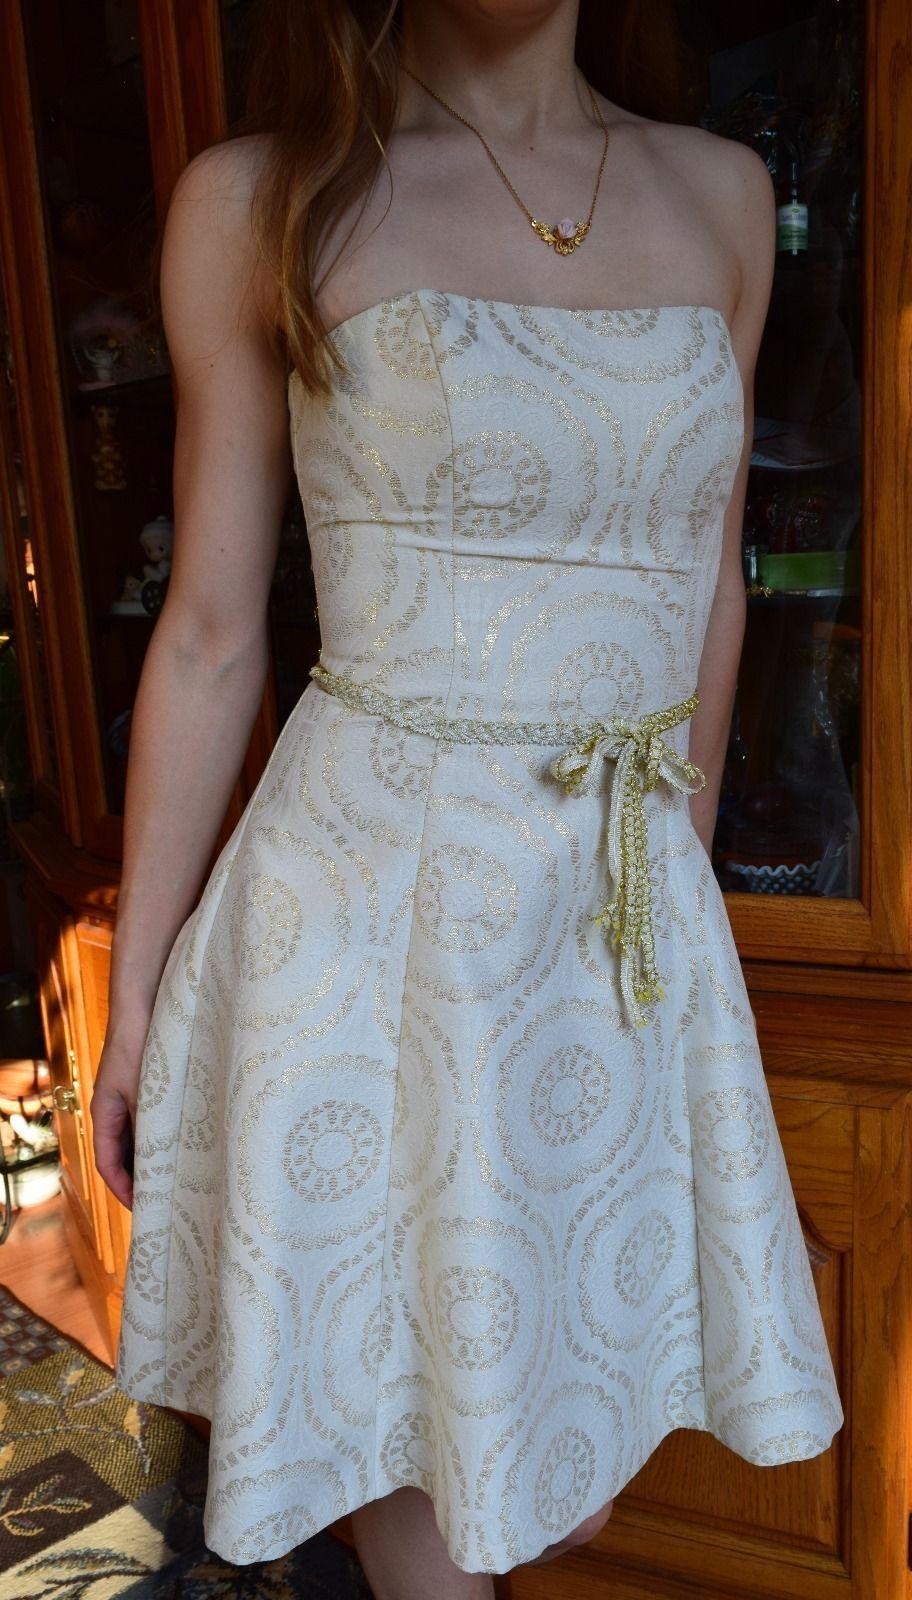 Awesome great de laru sheila yen dress white gold party evening prom